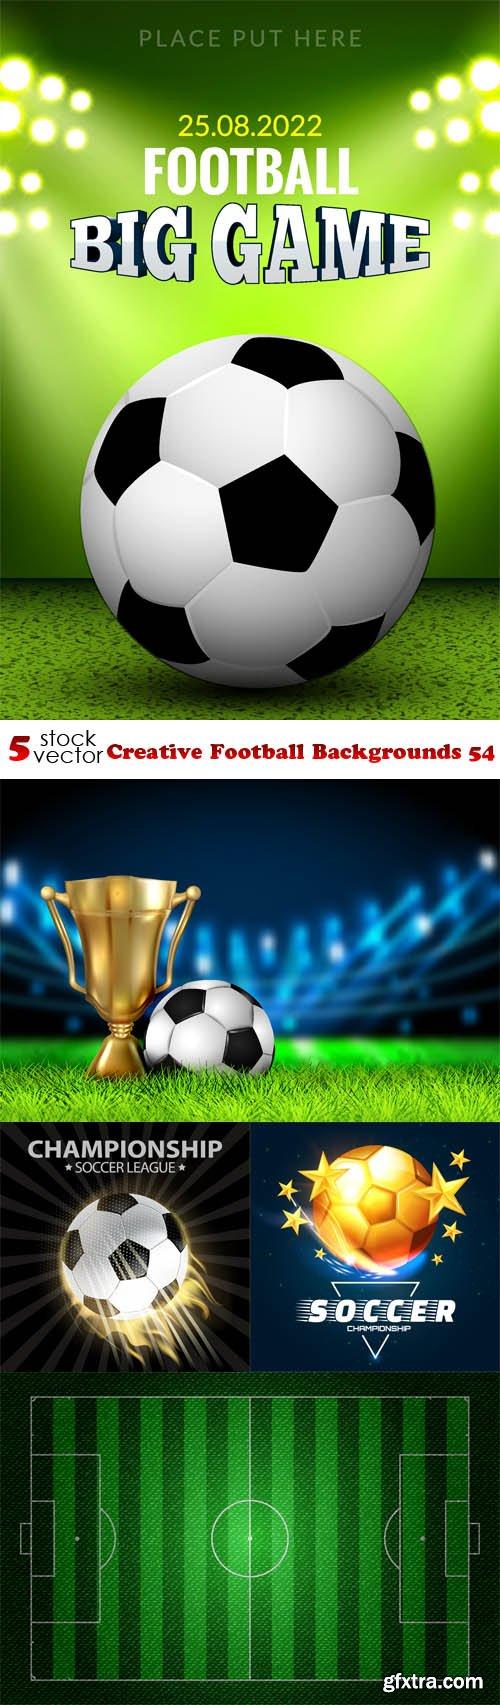 Vectors - Creative Football Backgrounds 54